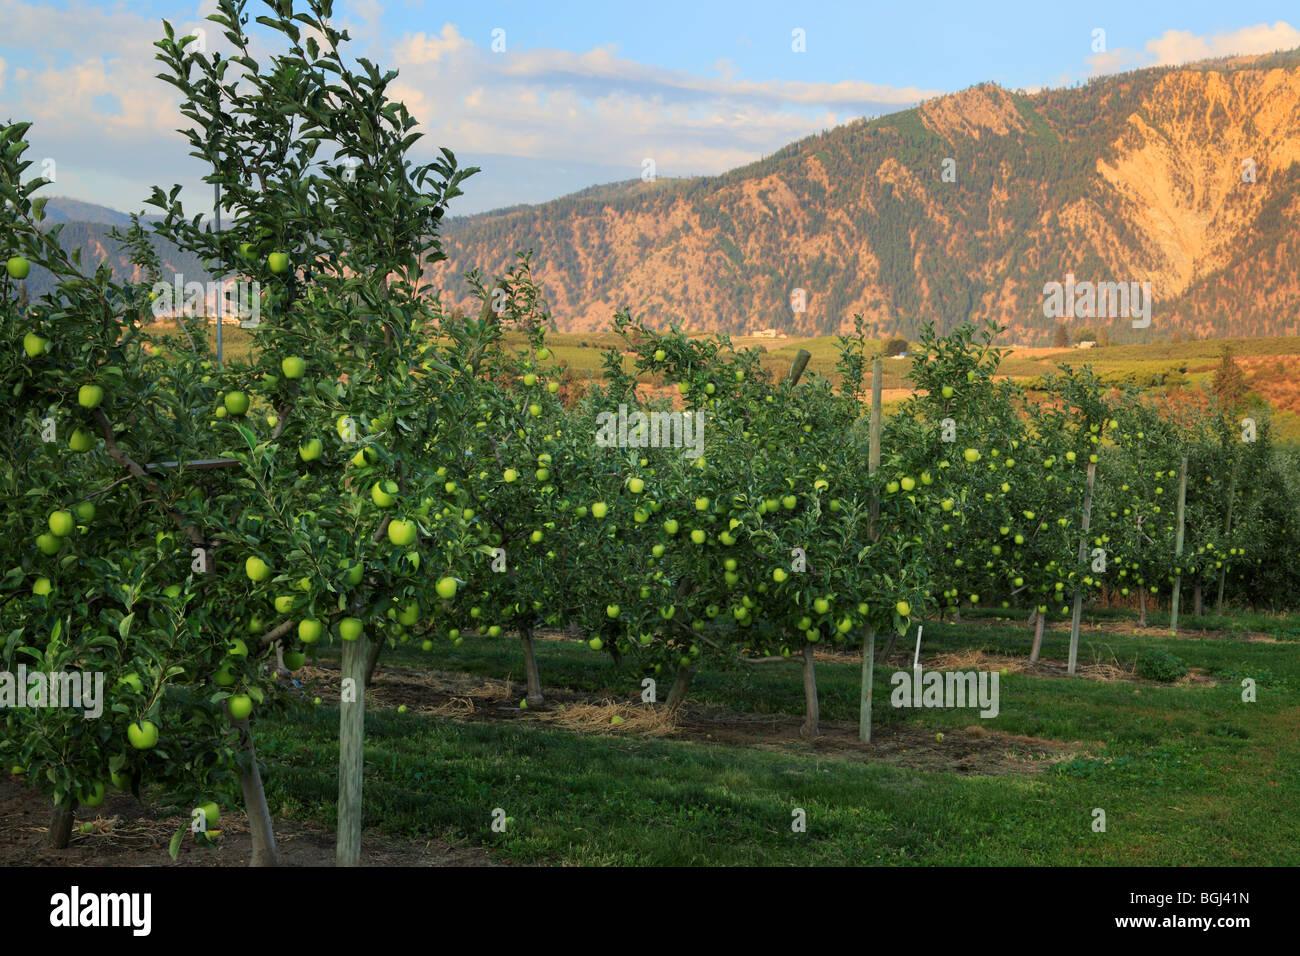 Apple orchard in Manson, Washington near Wapato Lake - Stock Image